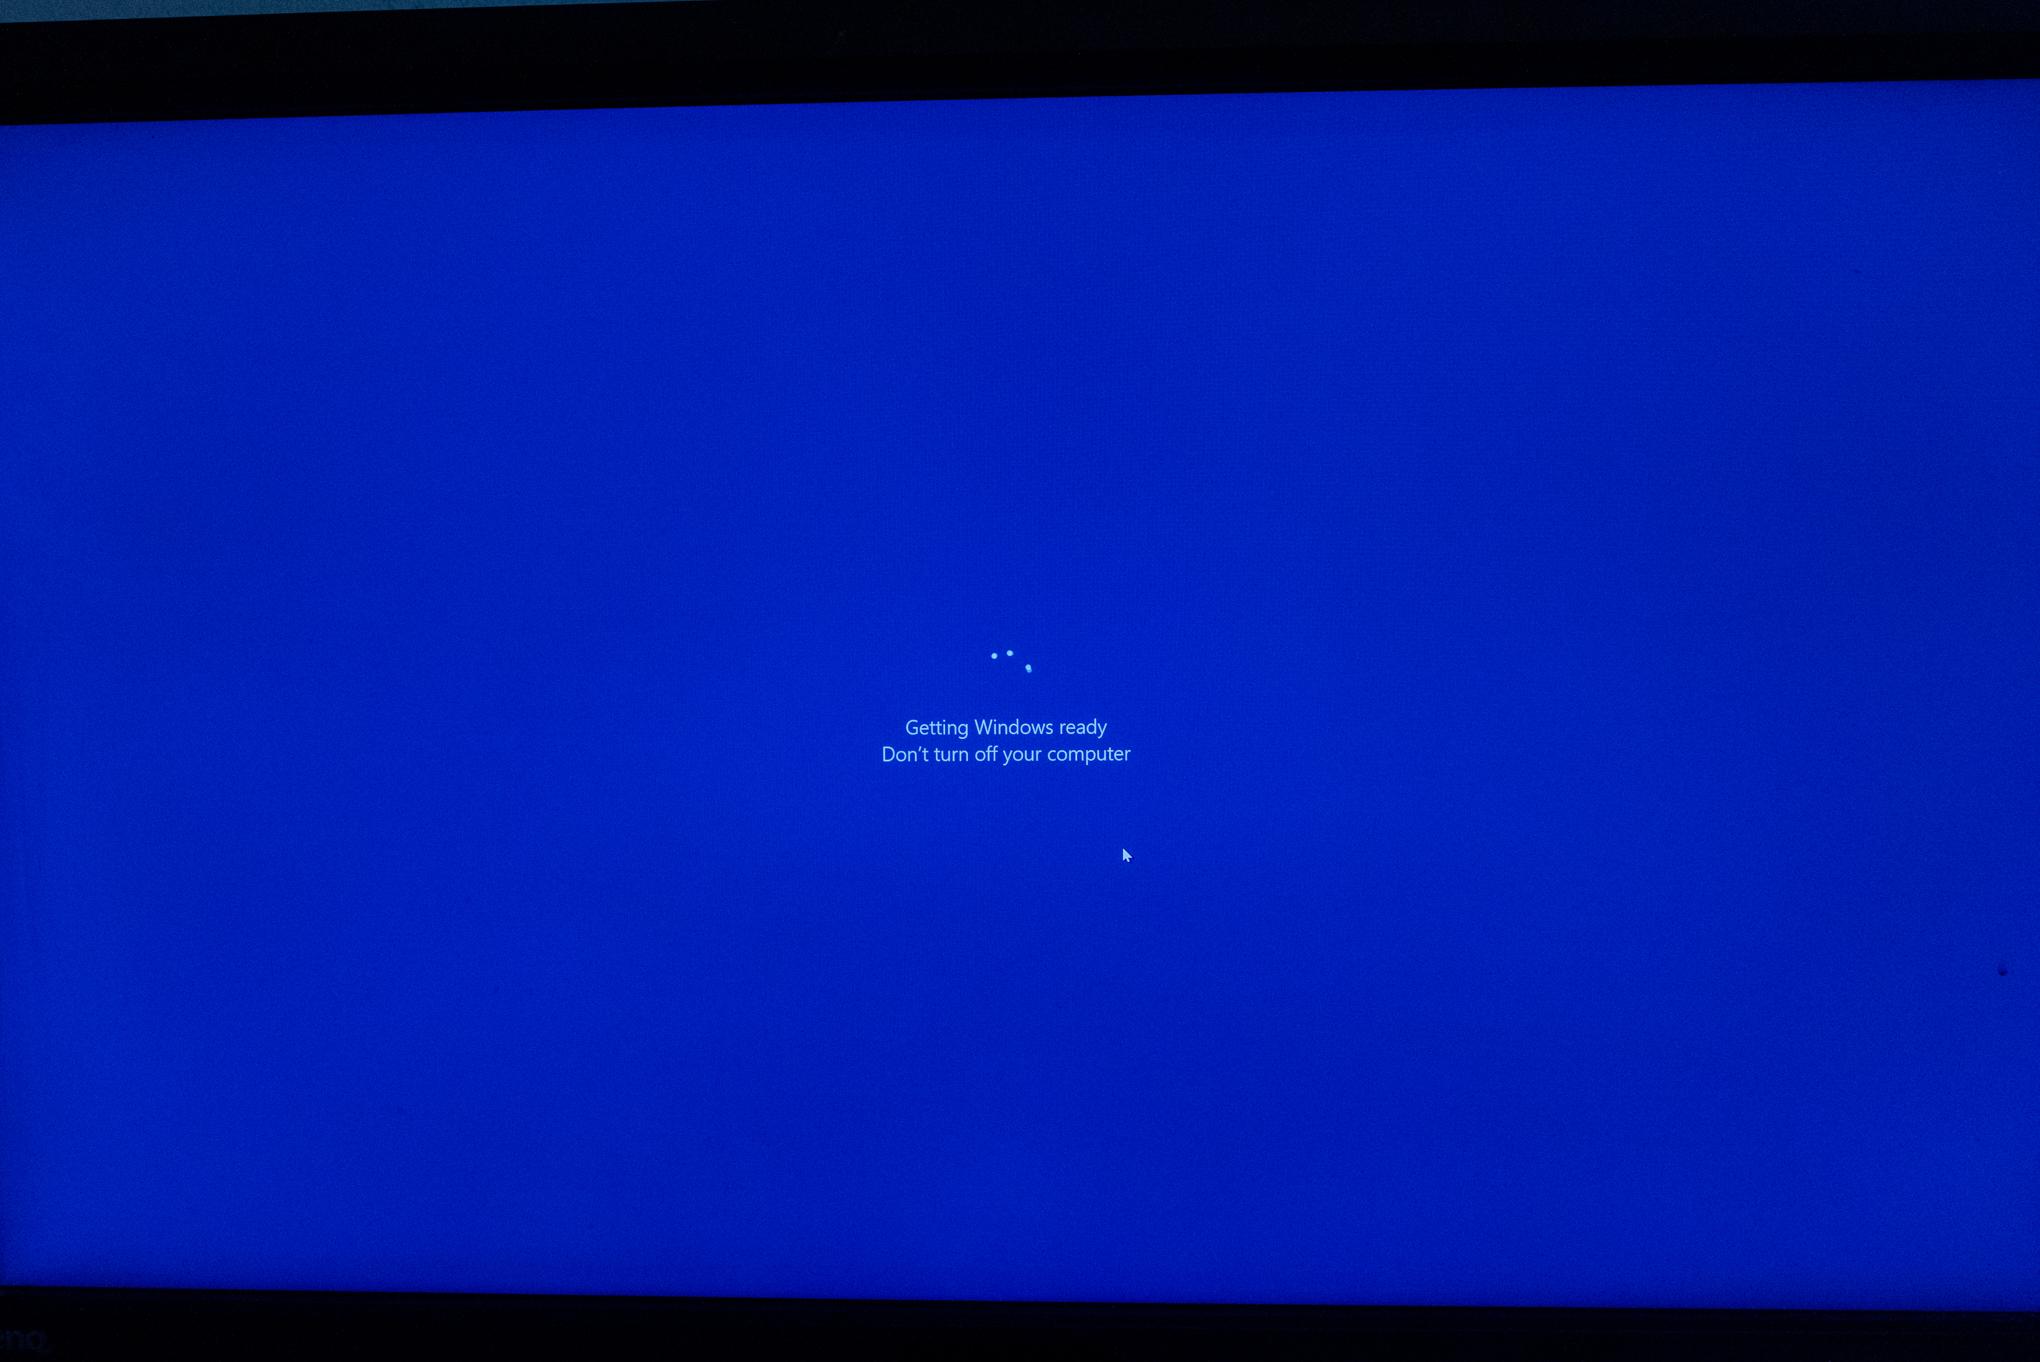 Windows 10 Education update